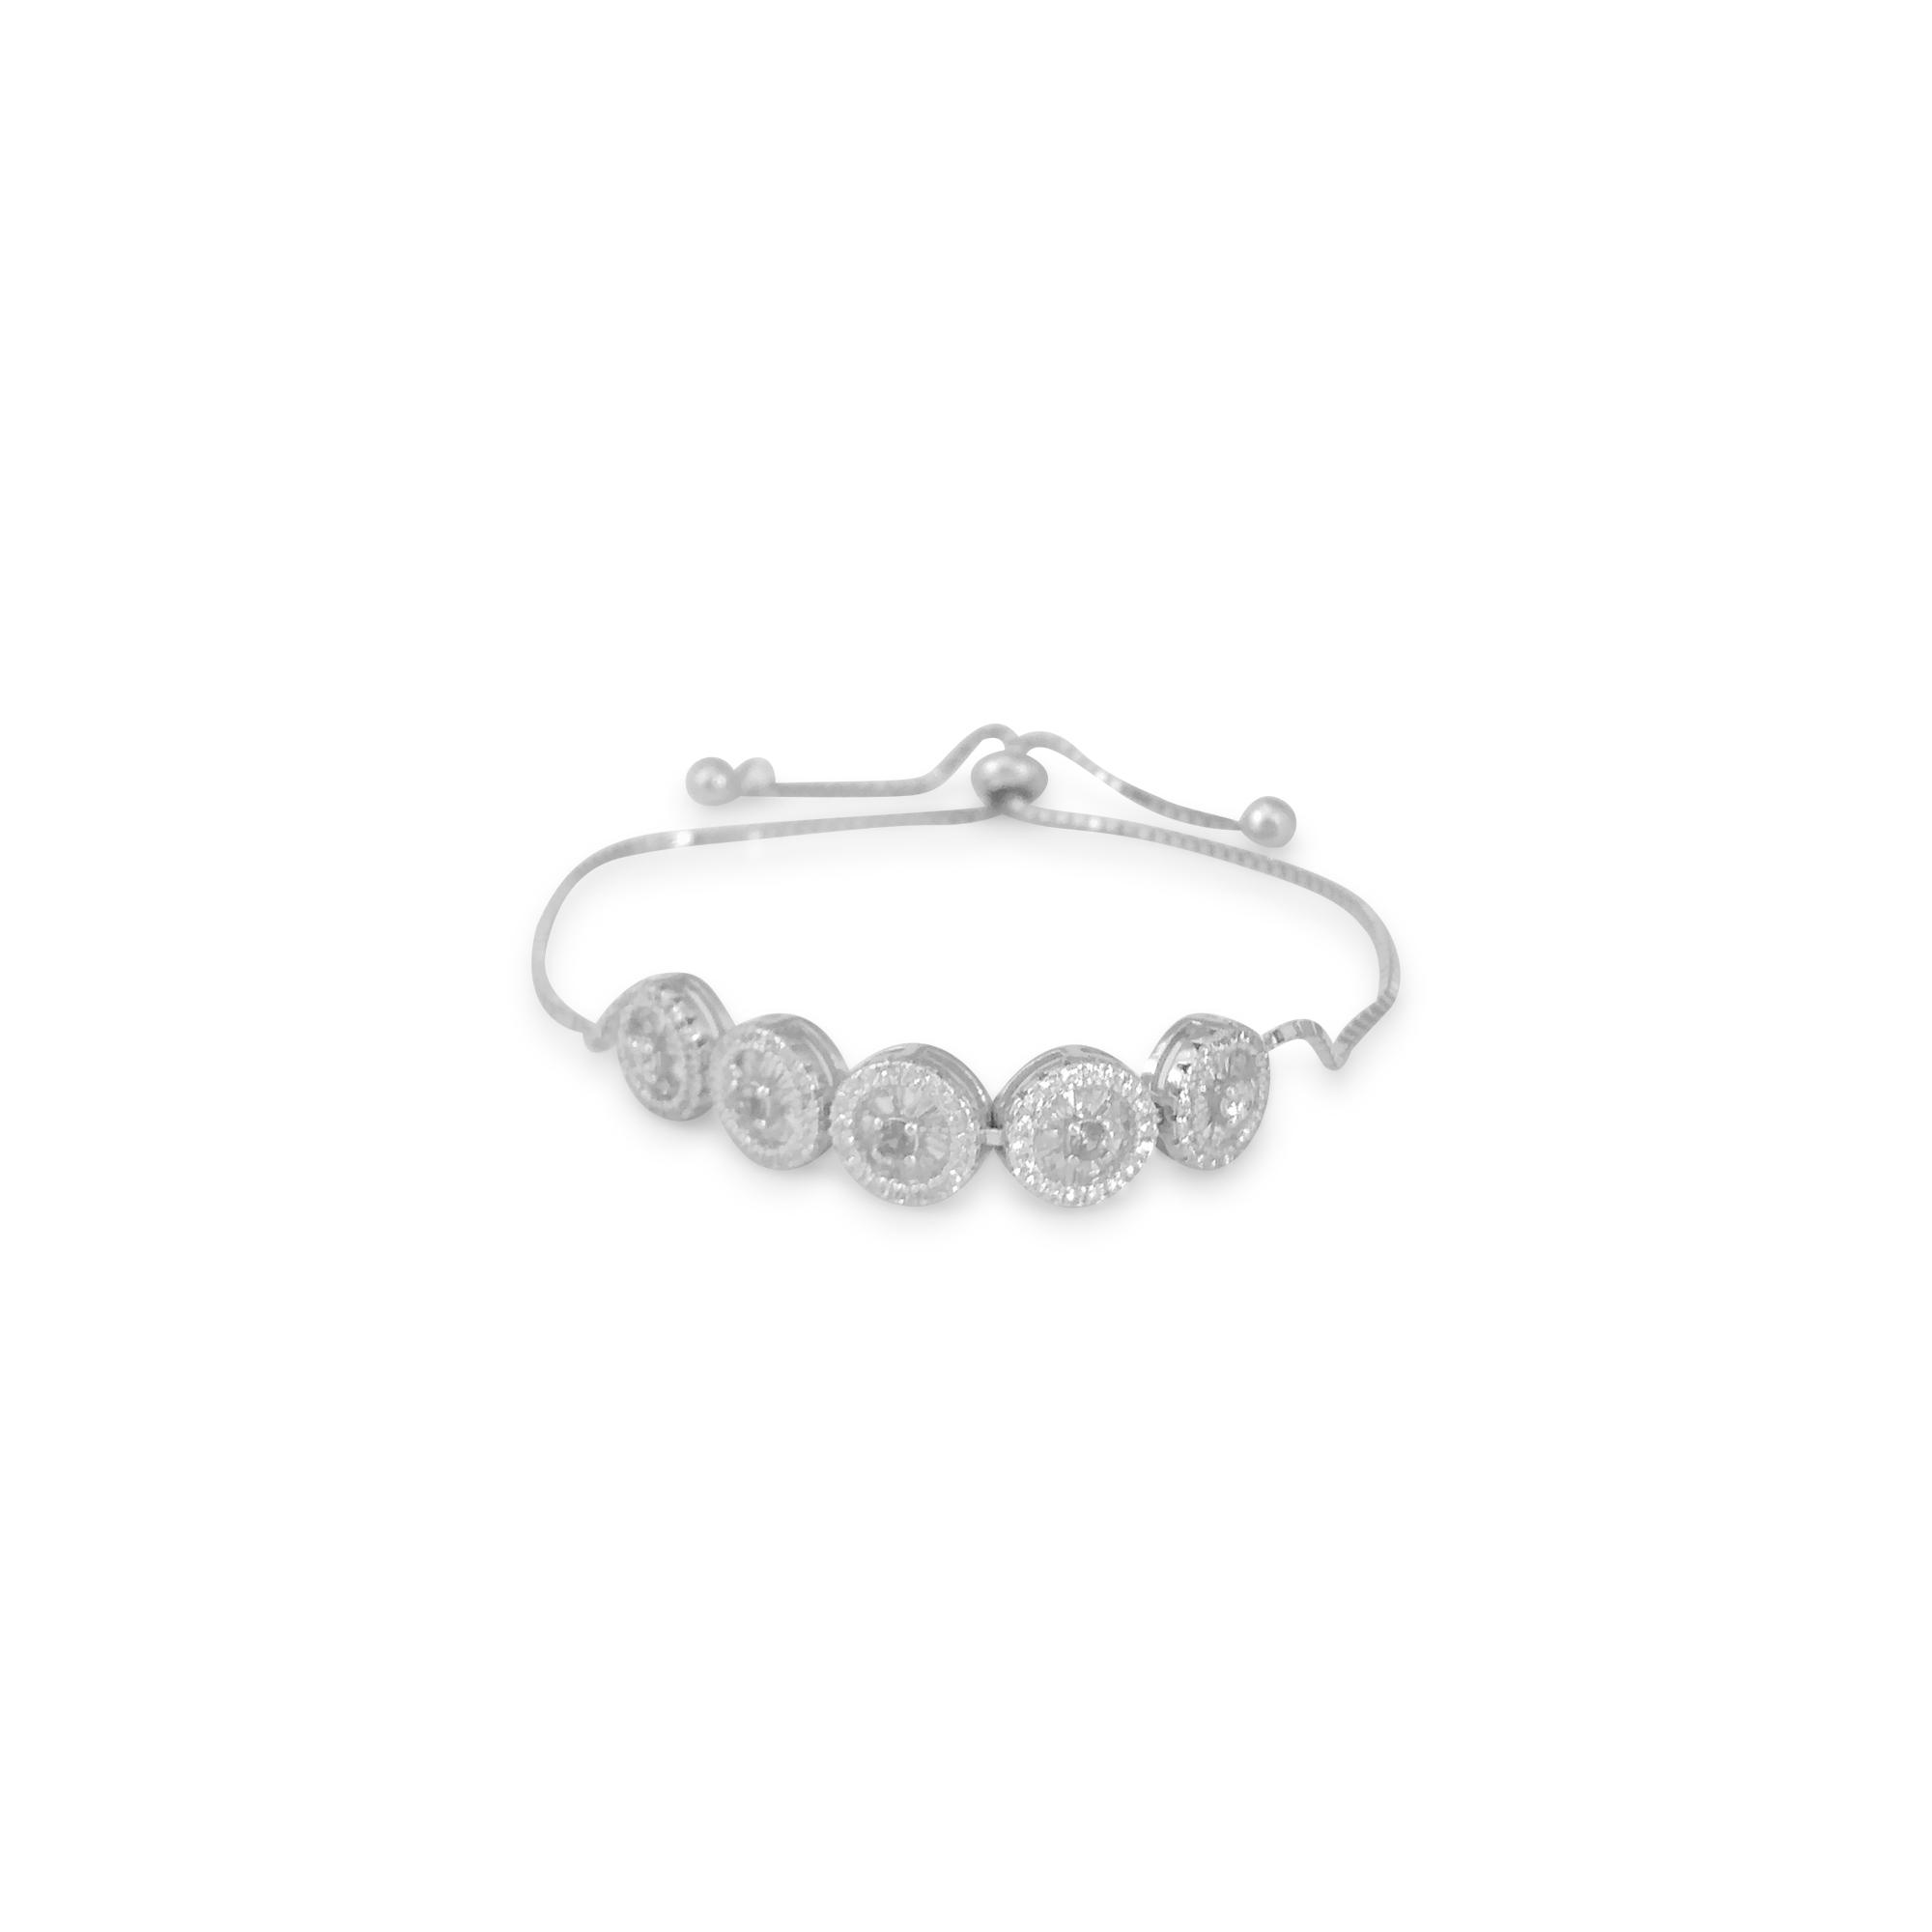 Petite Balles Bracelet